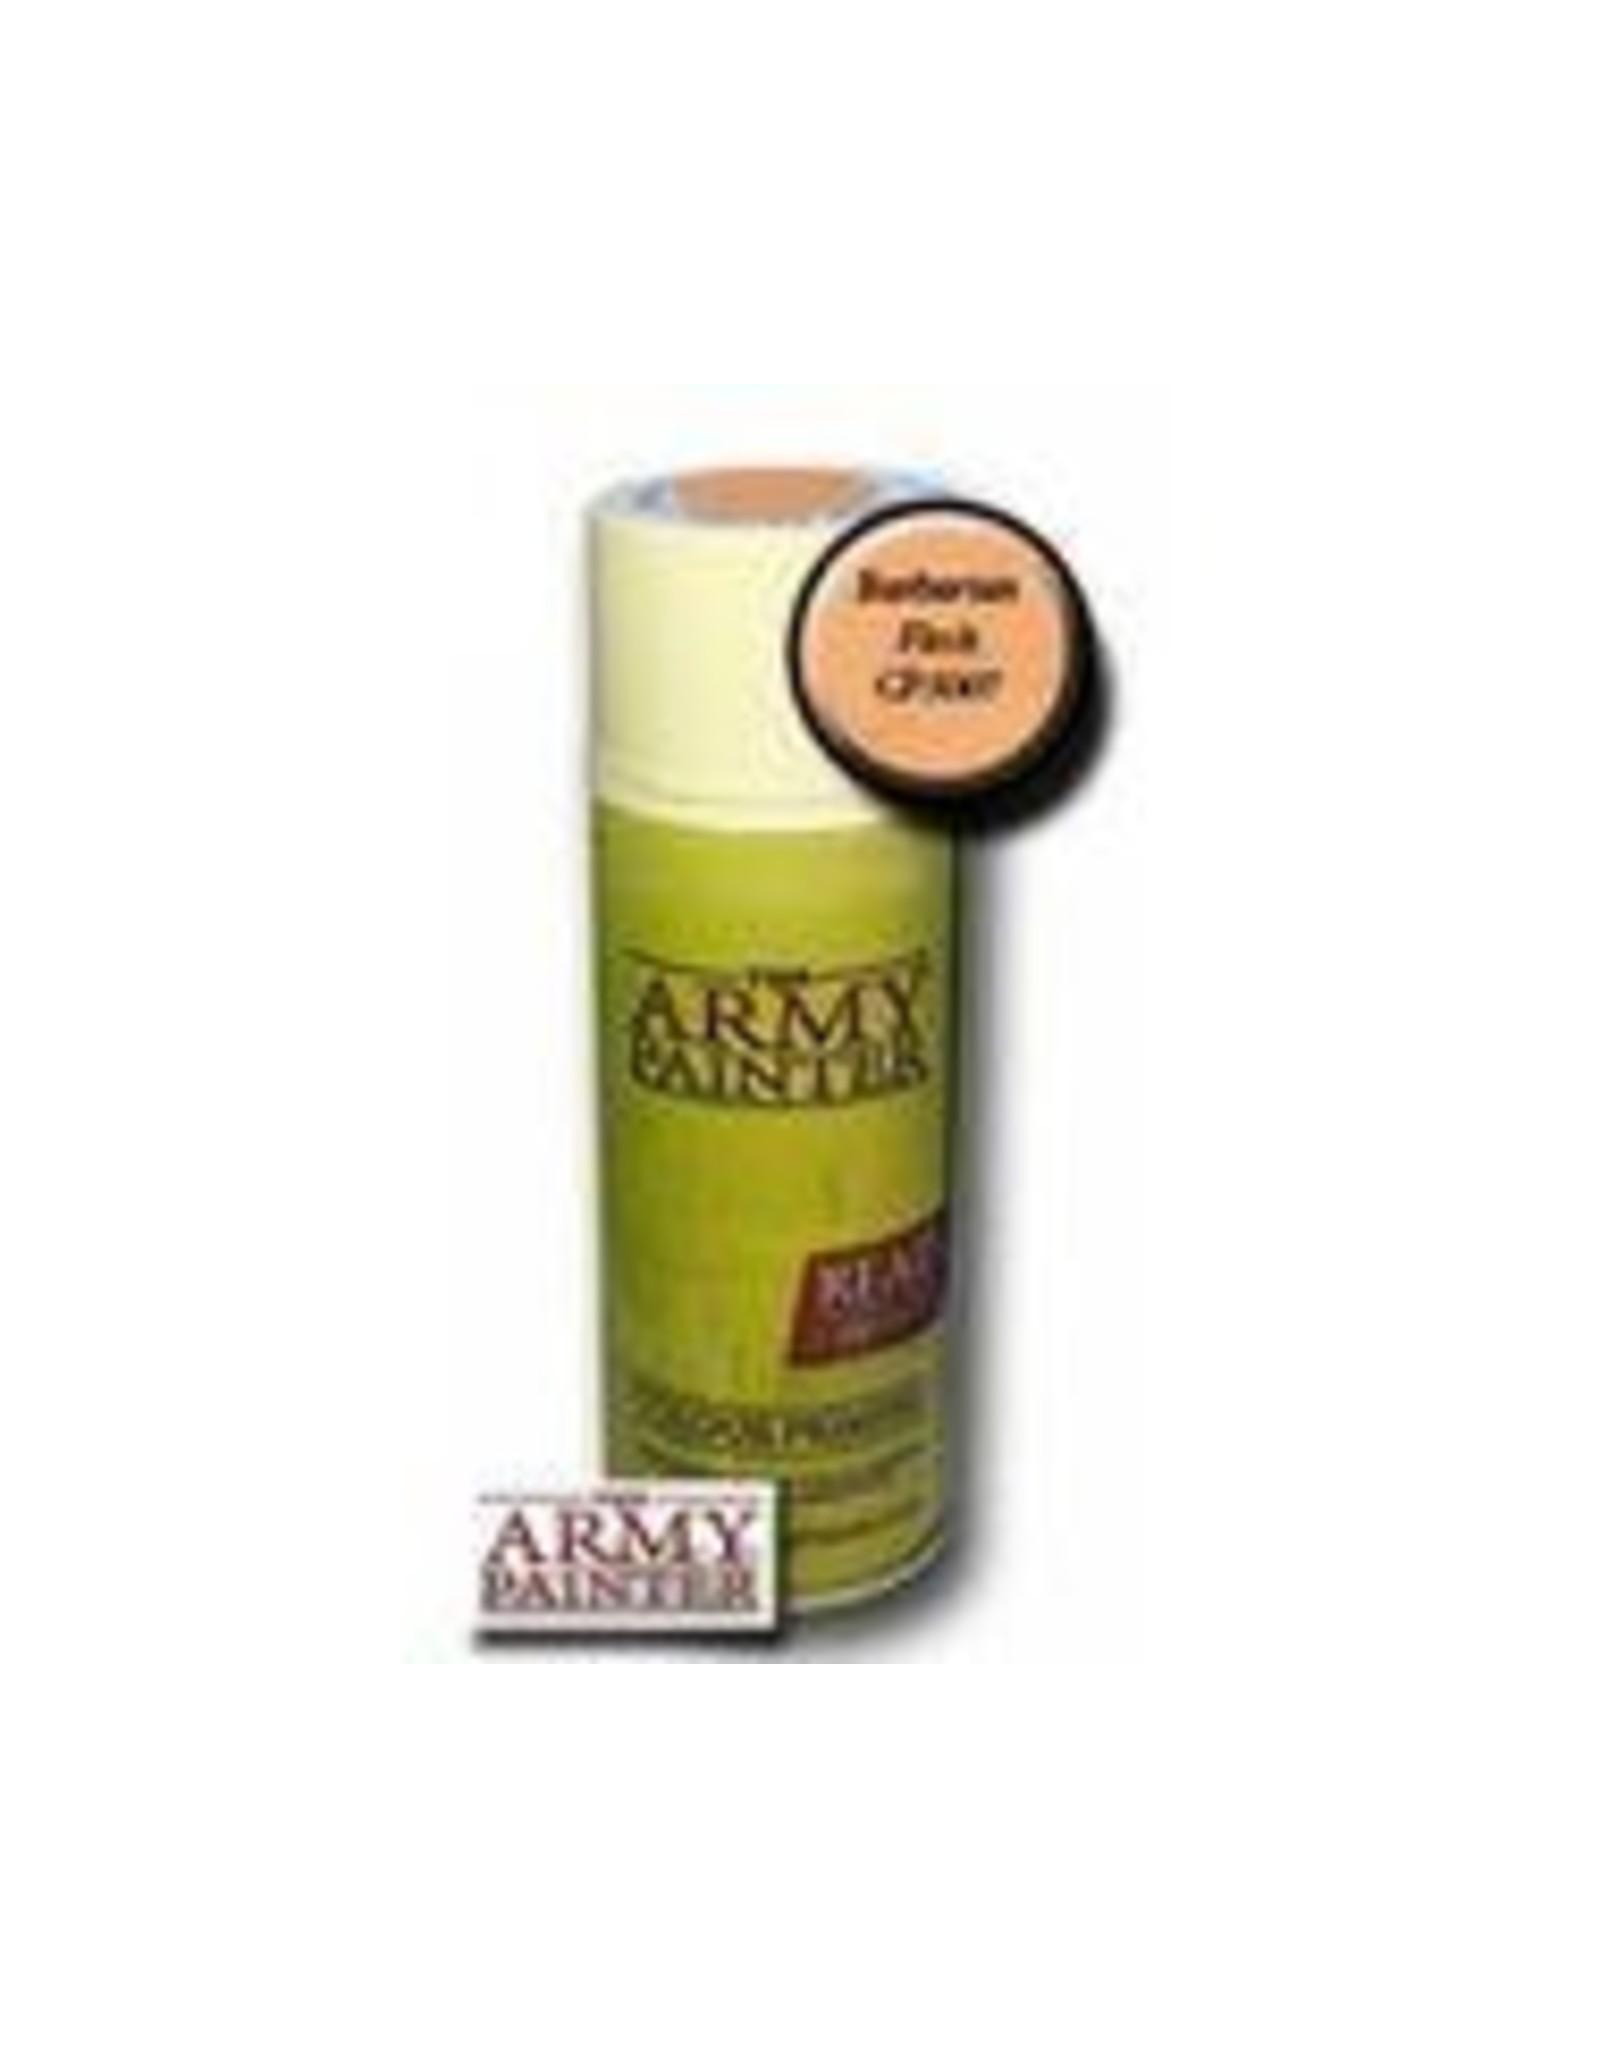 Army Painter Colour Primer: Barbarian Flesh